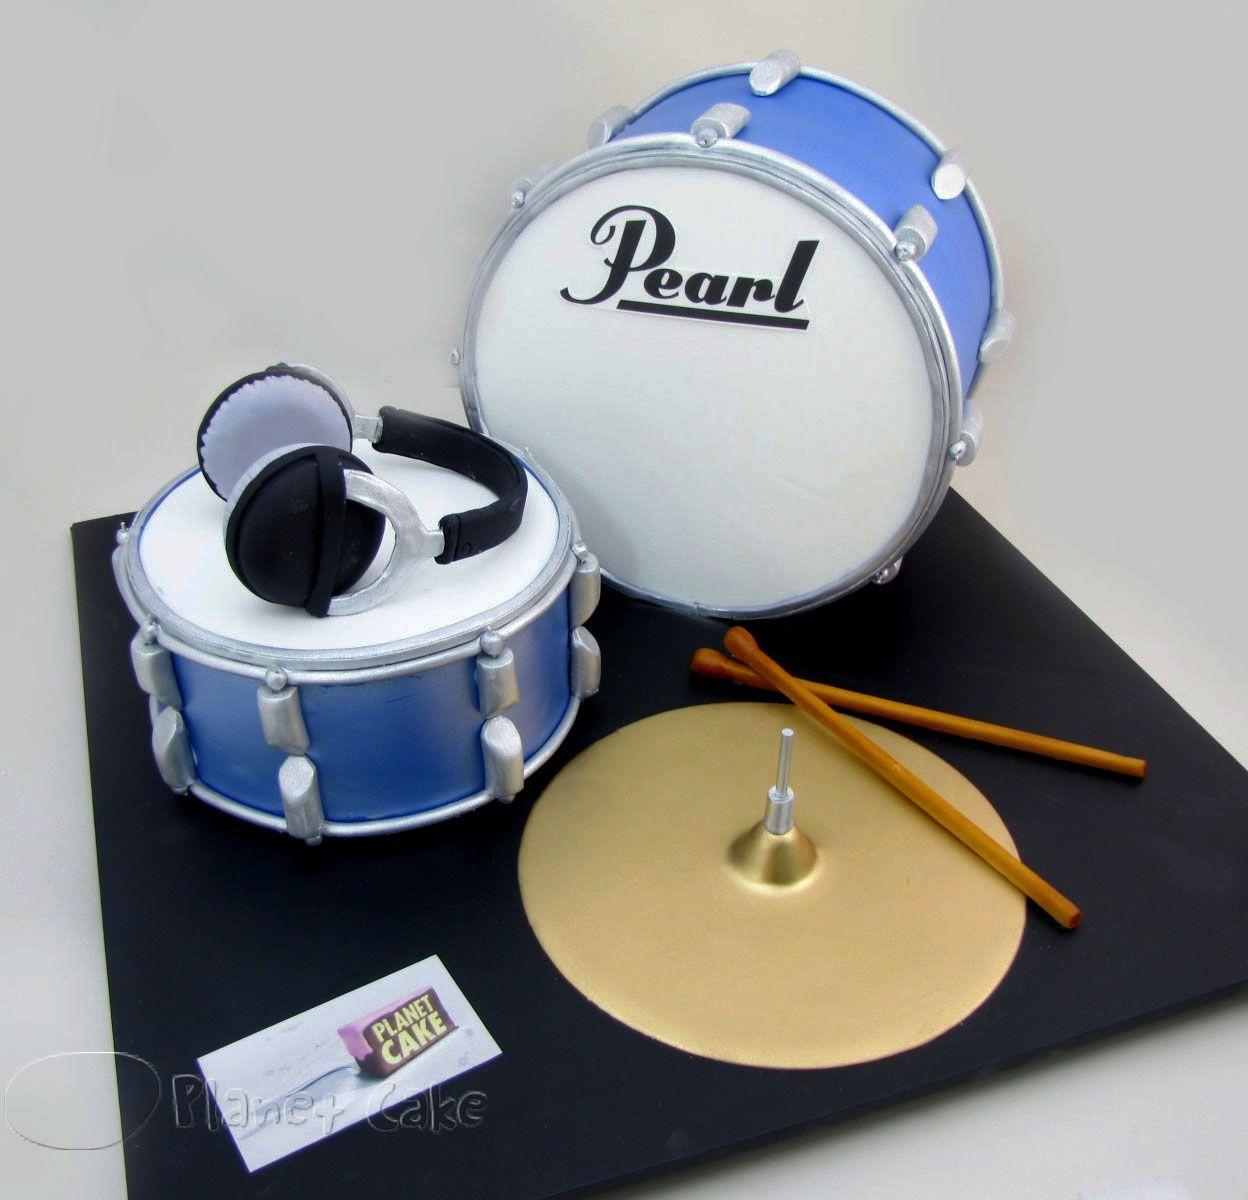 Cake Decorations Drum Kit : Drum Set Cake by www.planetcake.com.au cake decorating ...